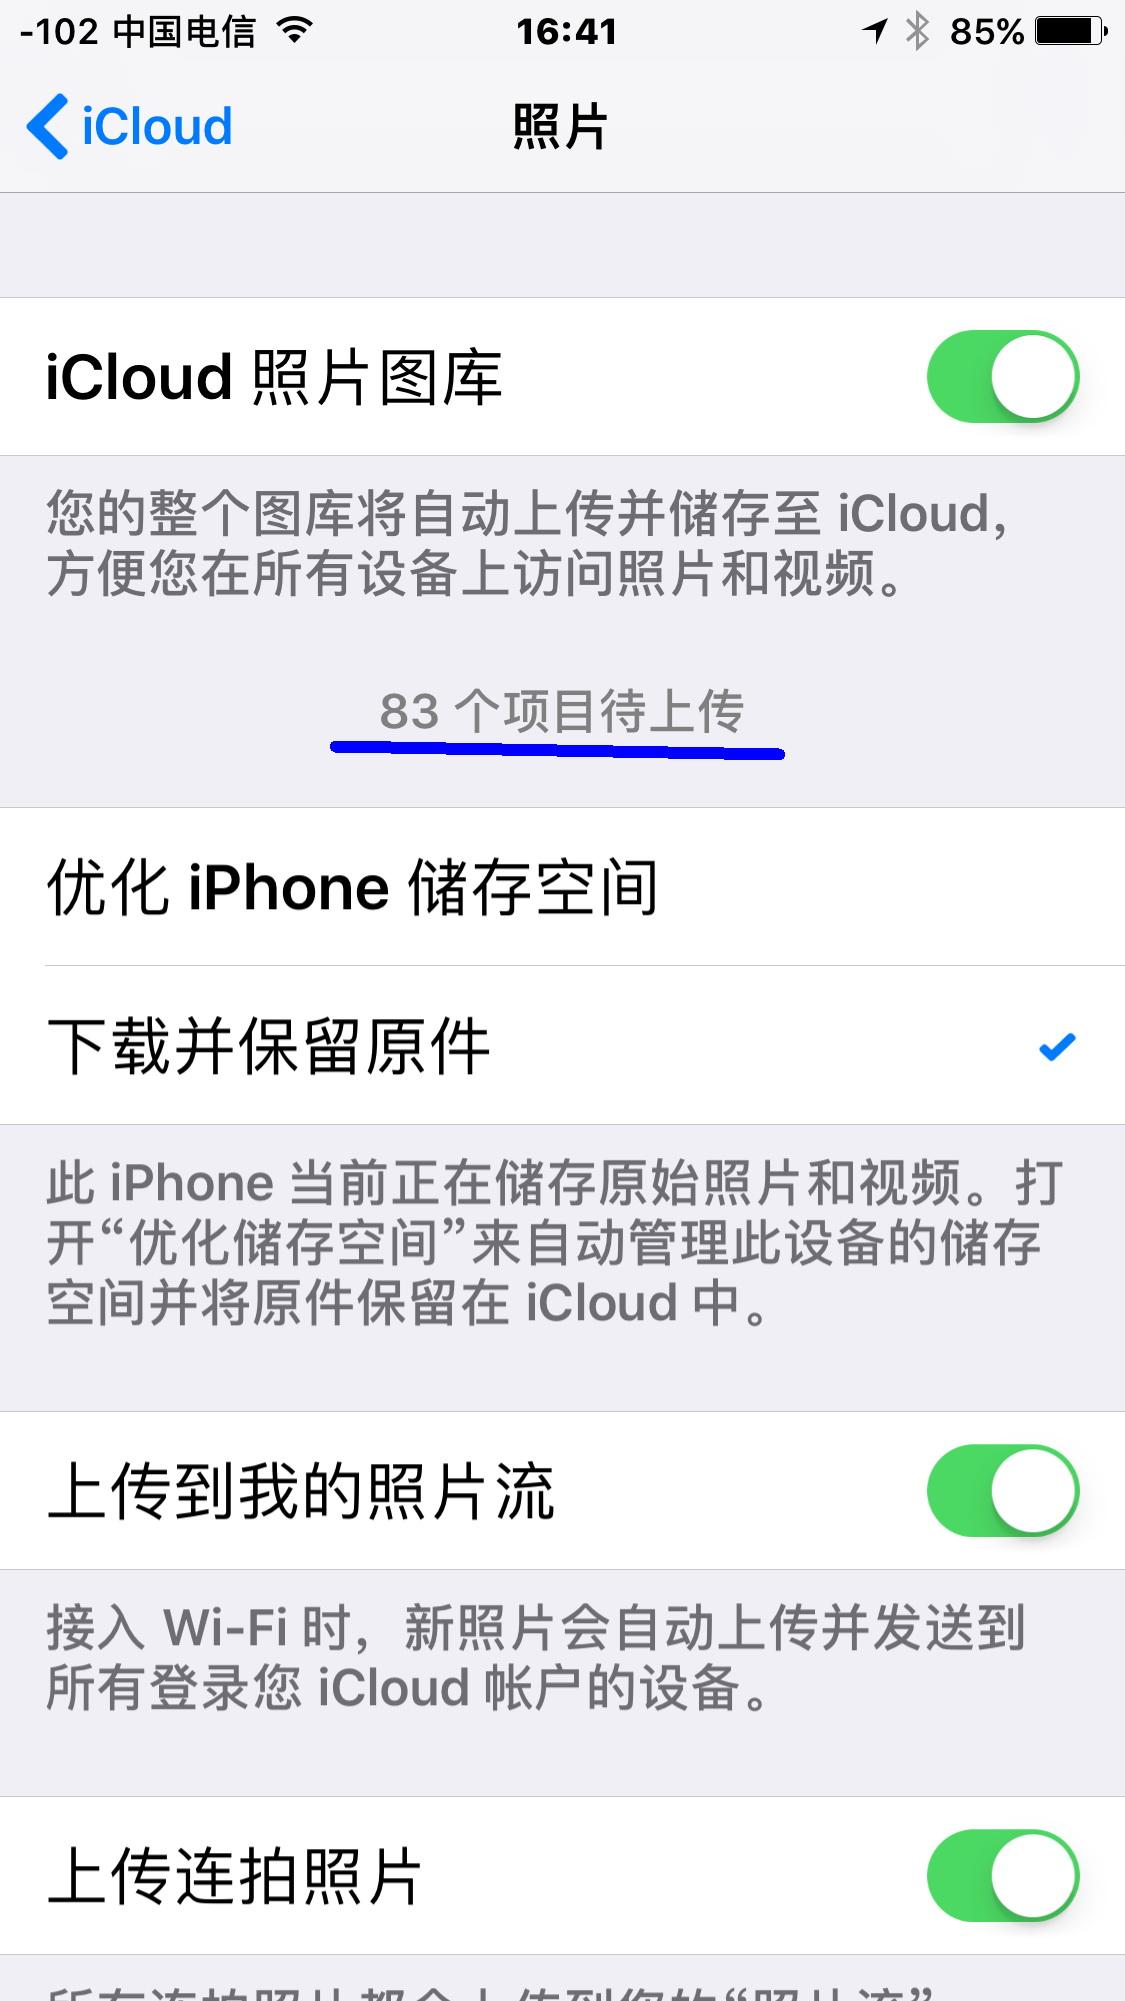 icloud照片流怎么用_怎么把iPhone 里的照片上传到iCloud上?_百度知道